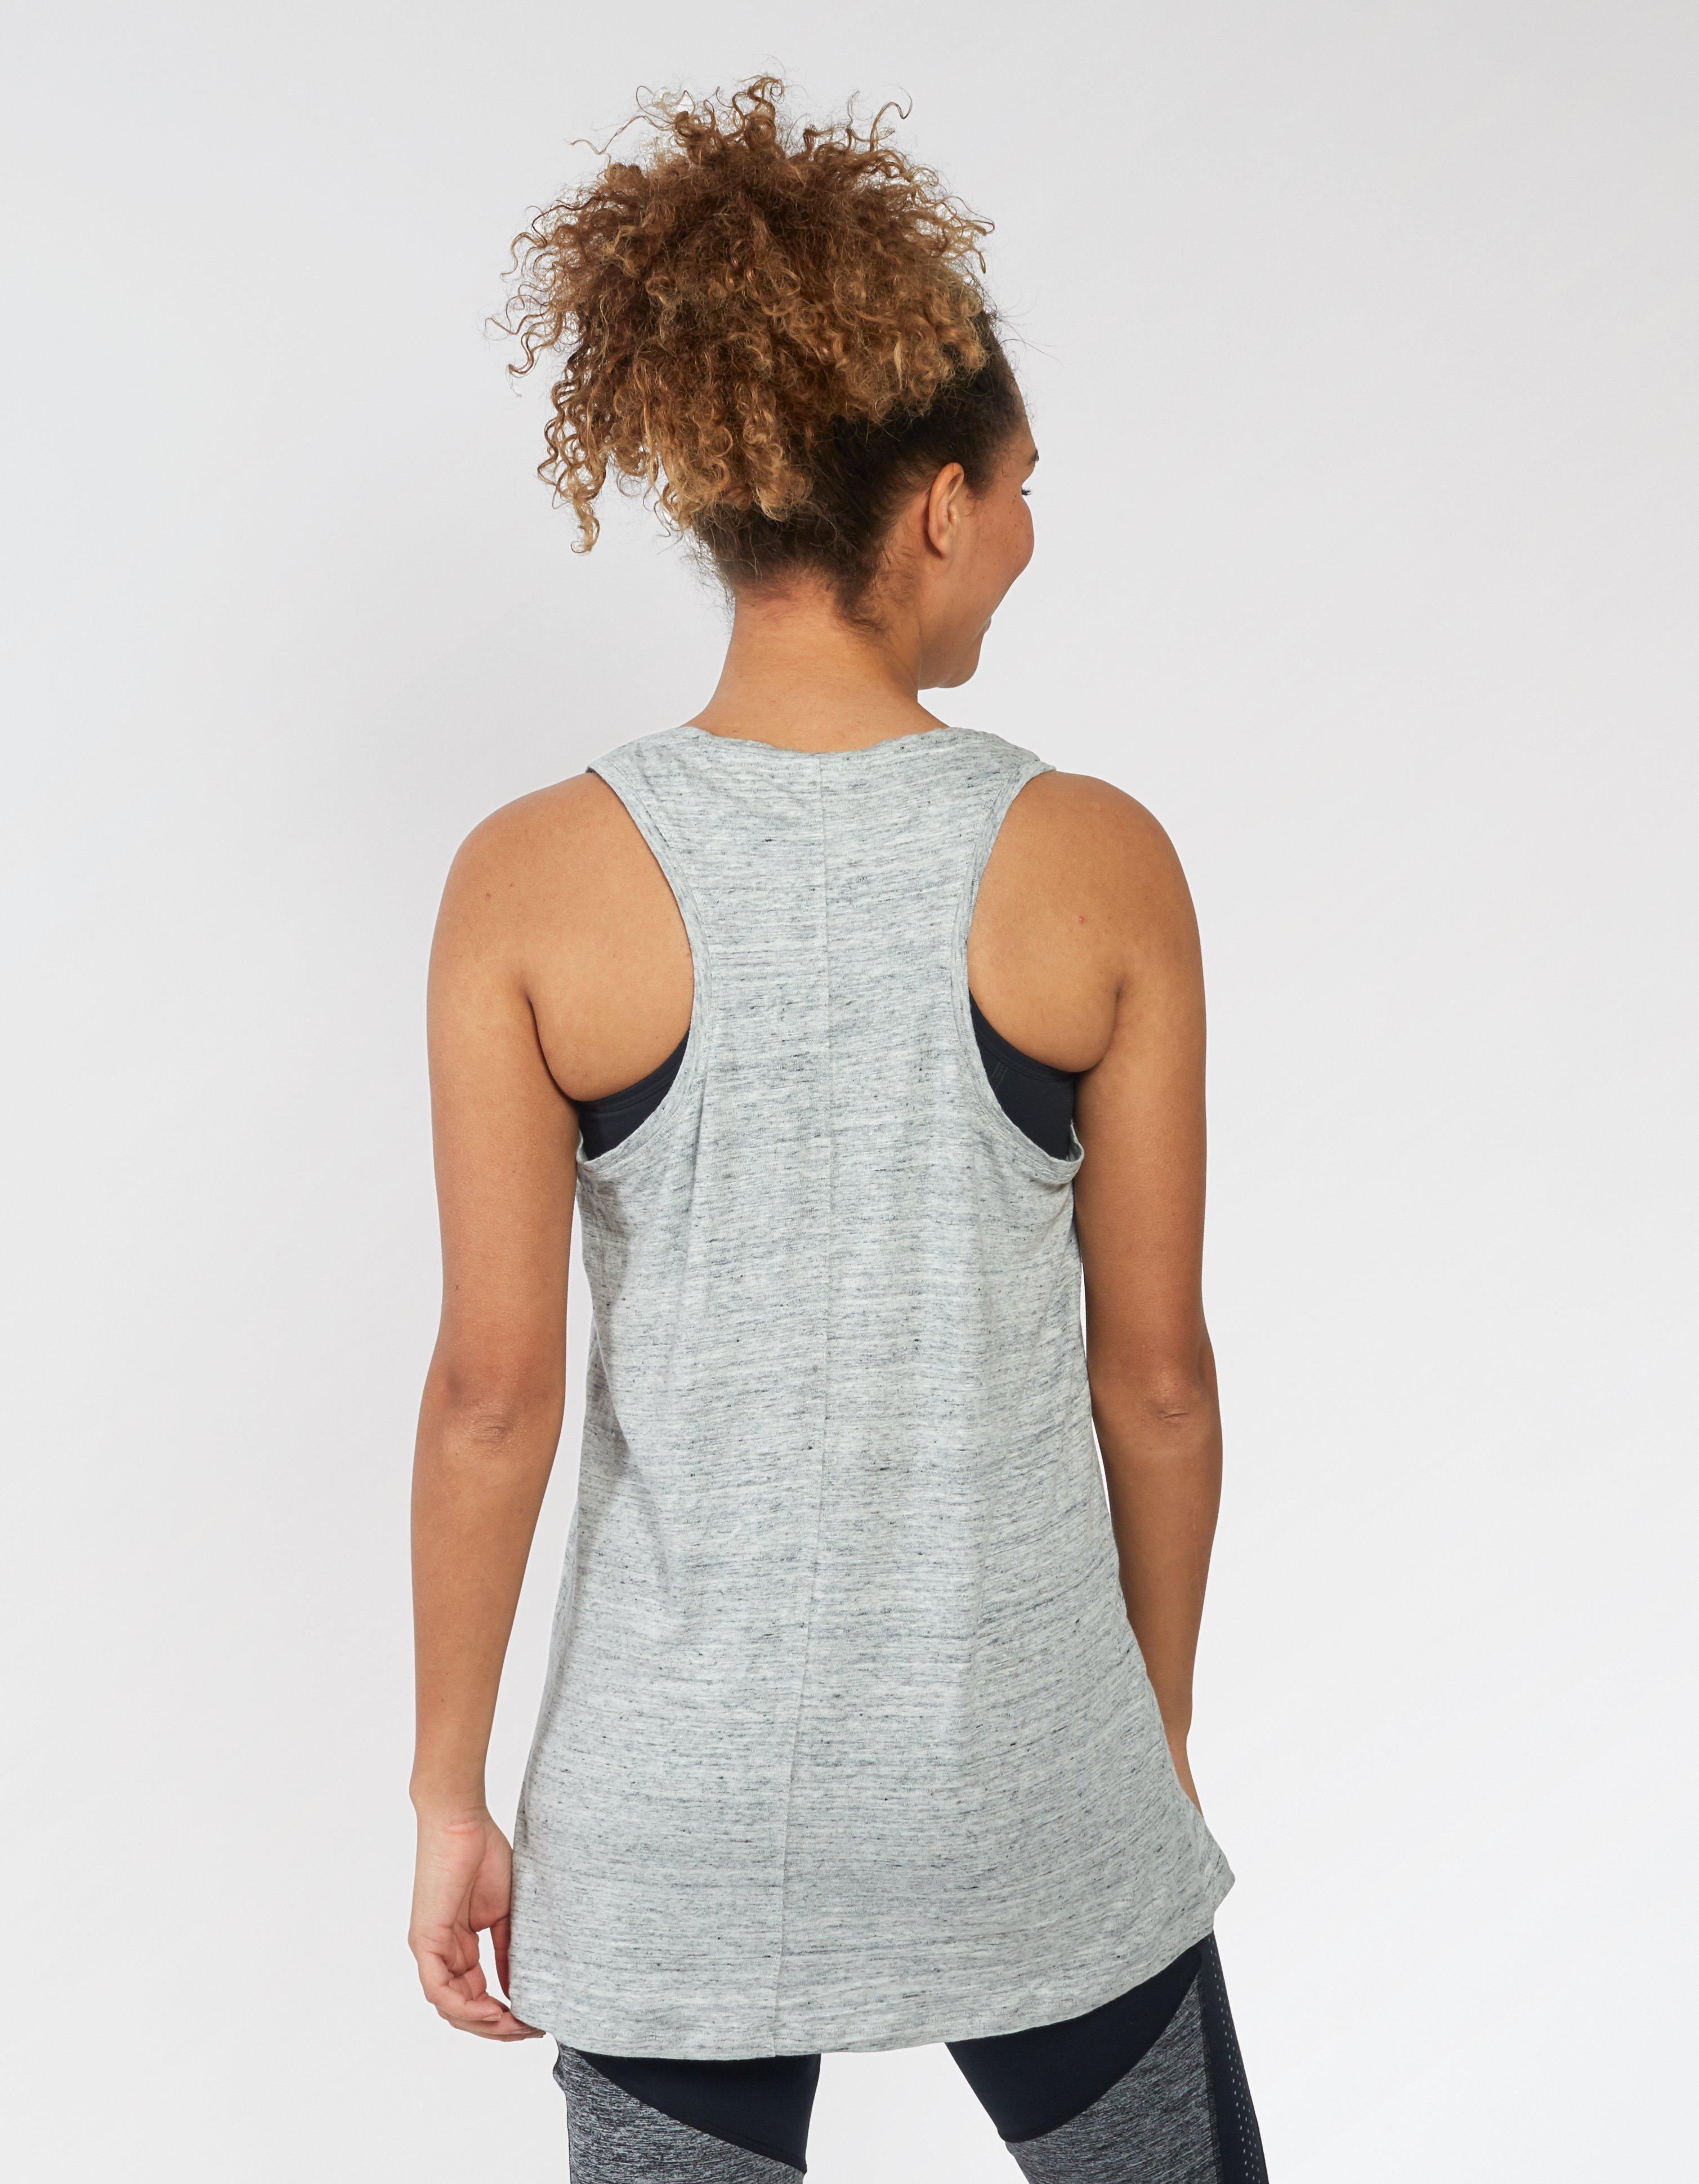 Athleisure Sally Racer Back Vest